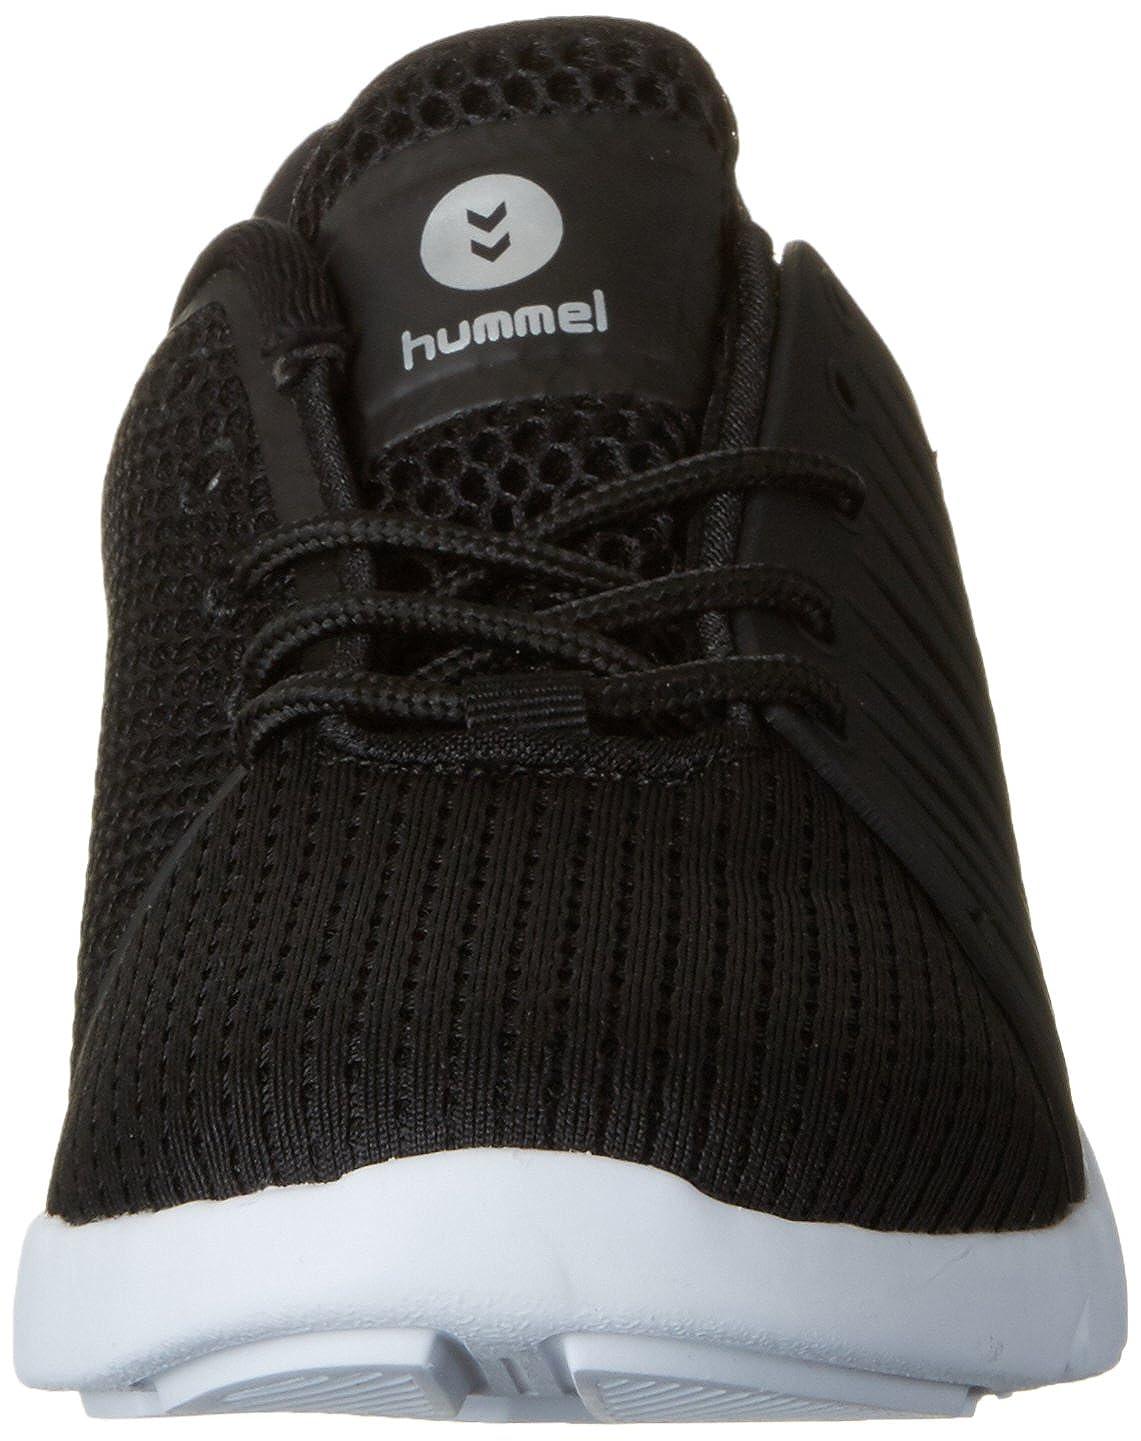 Hummel Hummel Hummel Unisex-Erwachsene Aerofly Mx120 Niedrig-Top Schwarz (schwarz) e4d5a9